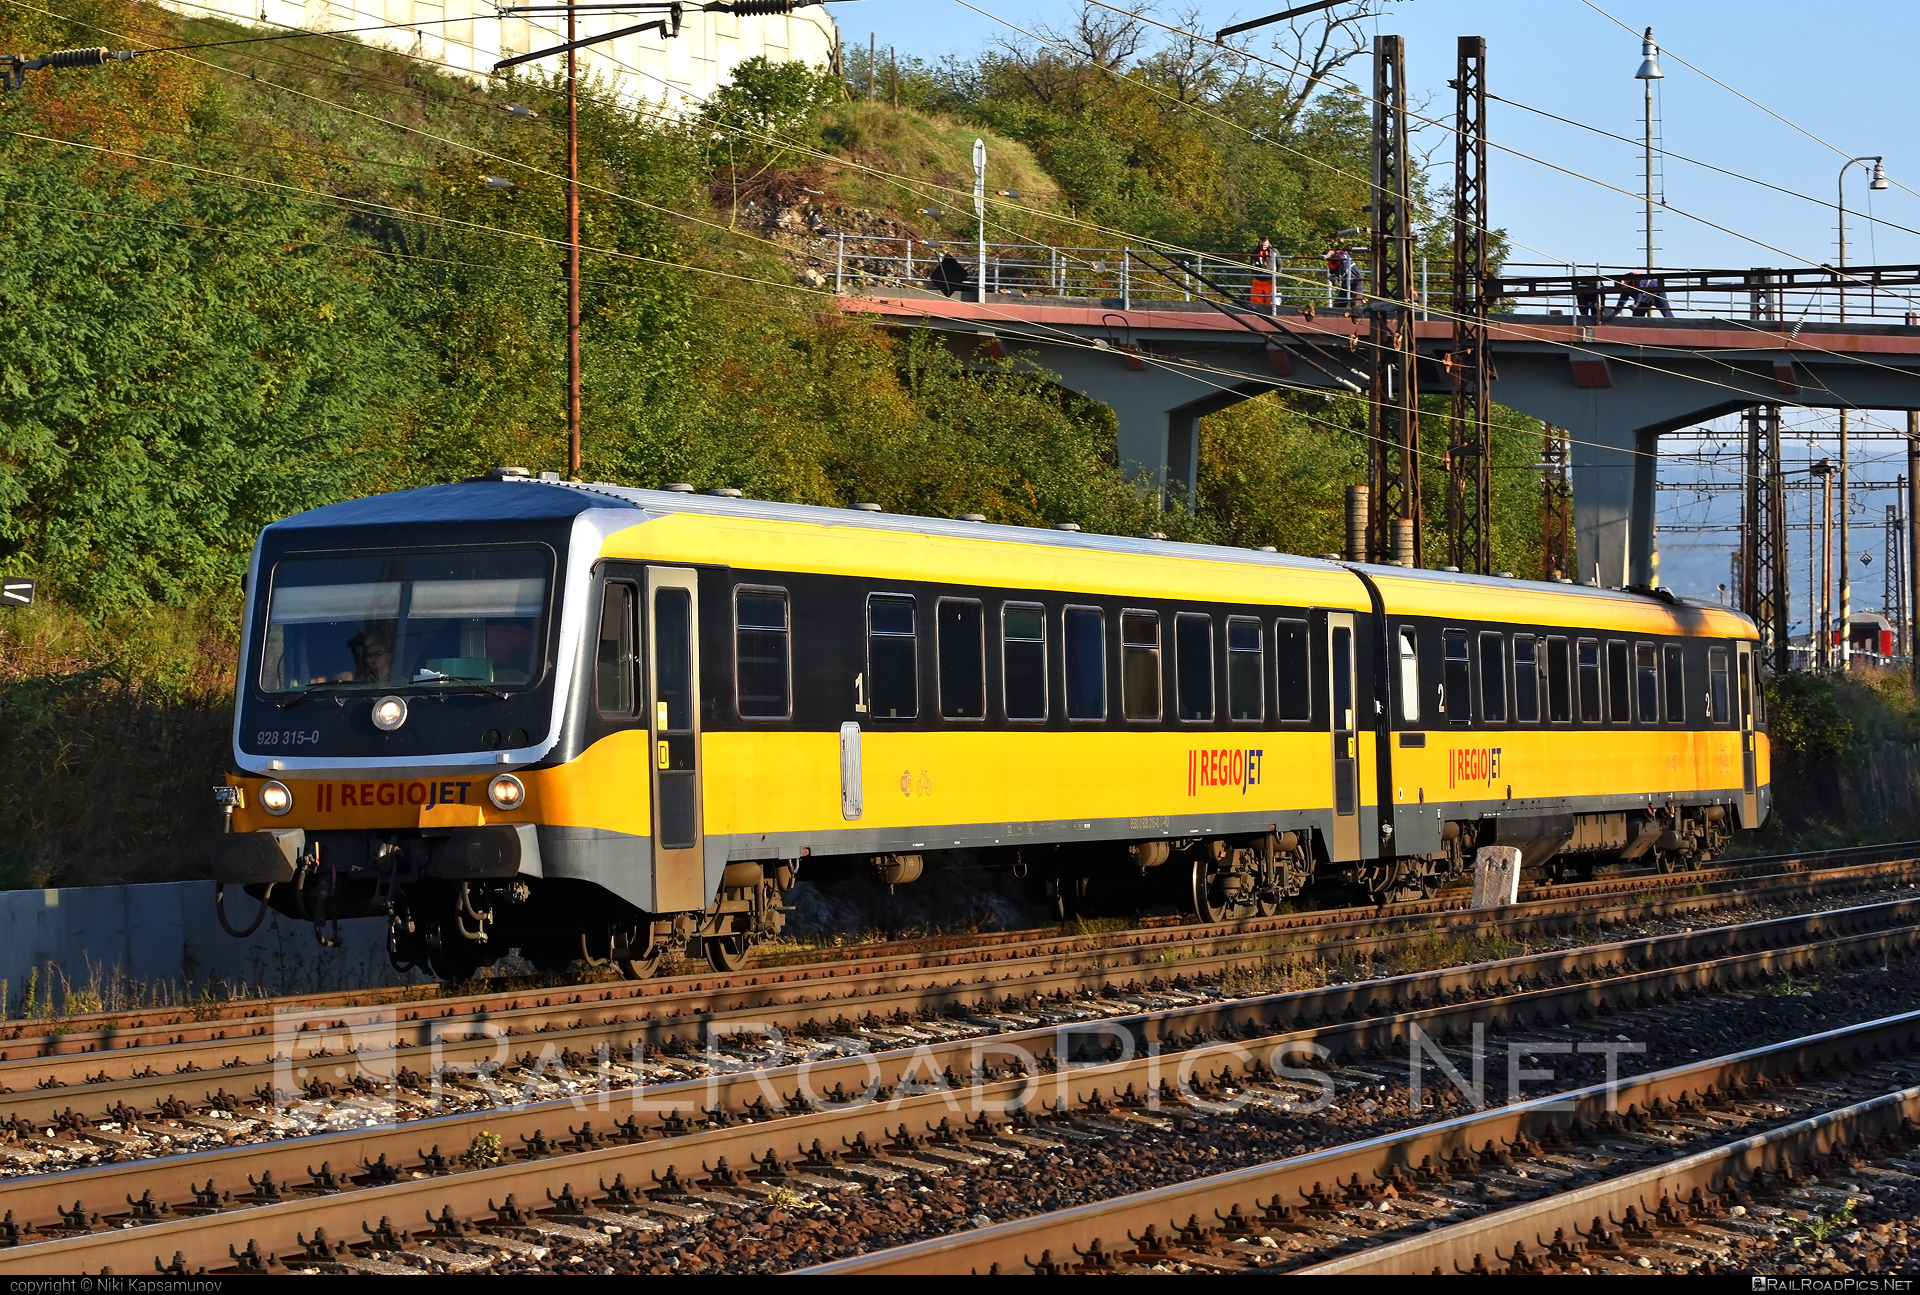 Düwag DB Class 628 - 928 315-0 operated by RegioJet, a.s. #dbclass628 #duewag #duewag628 #duwag #duwag628 #regiojet